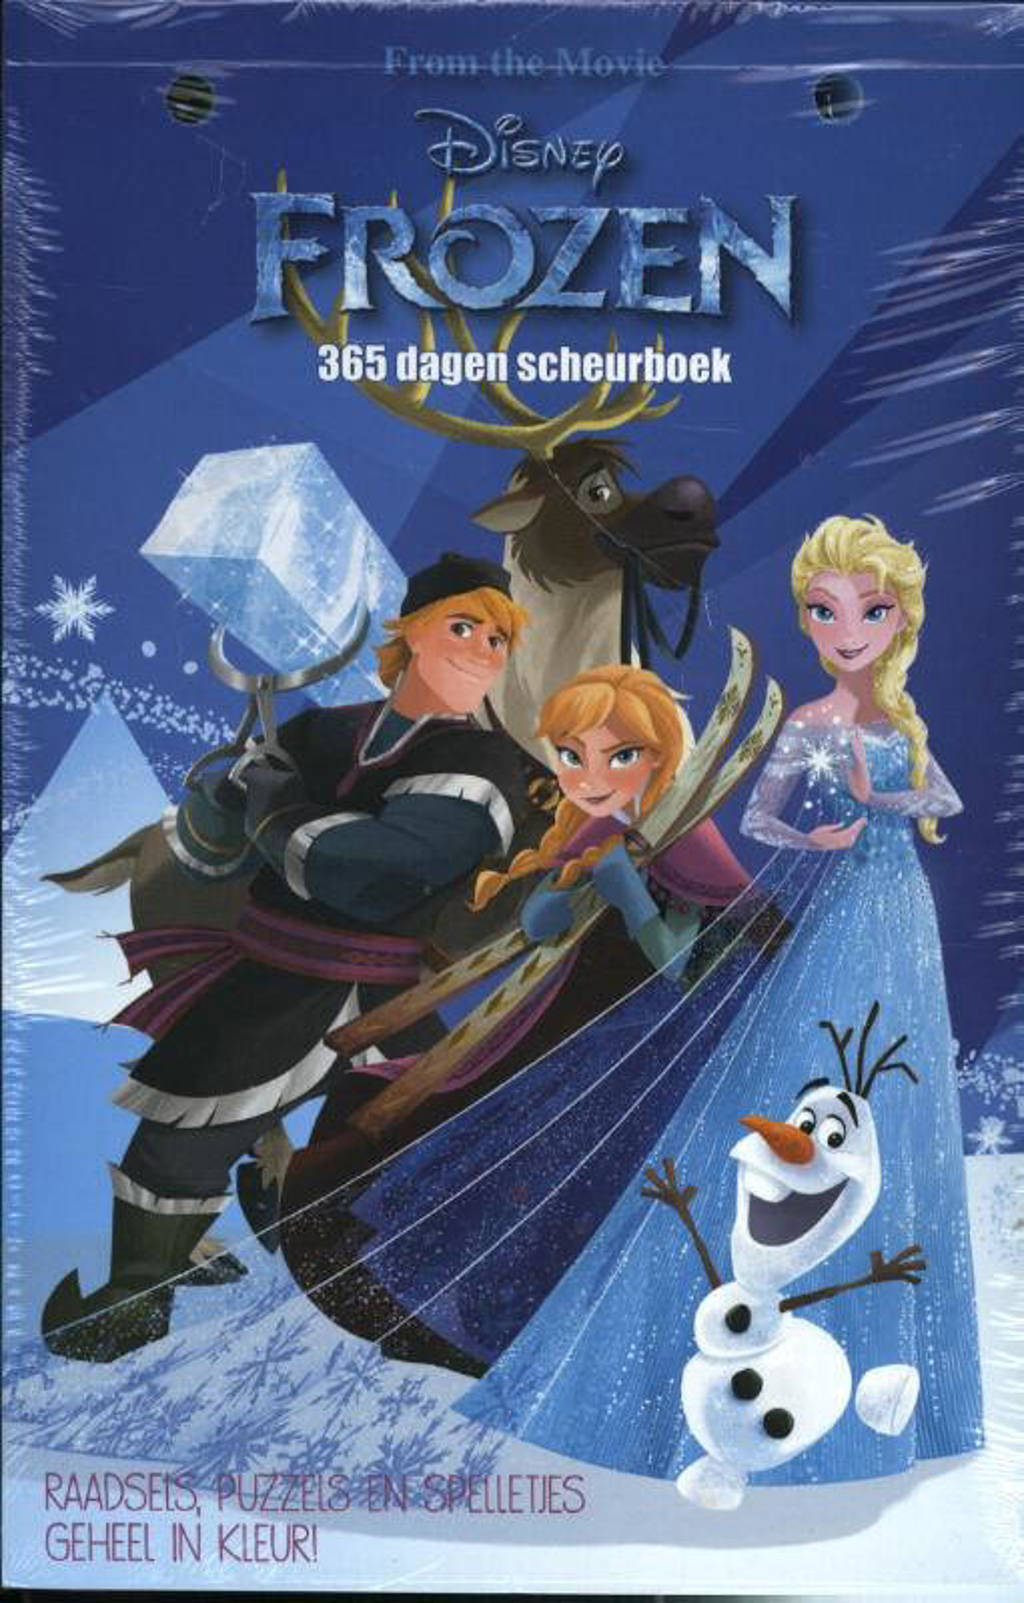 Frozen scheurkalender 2018